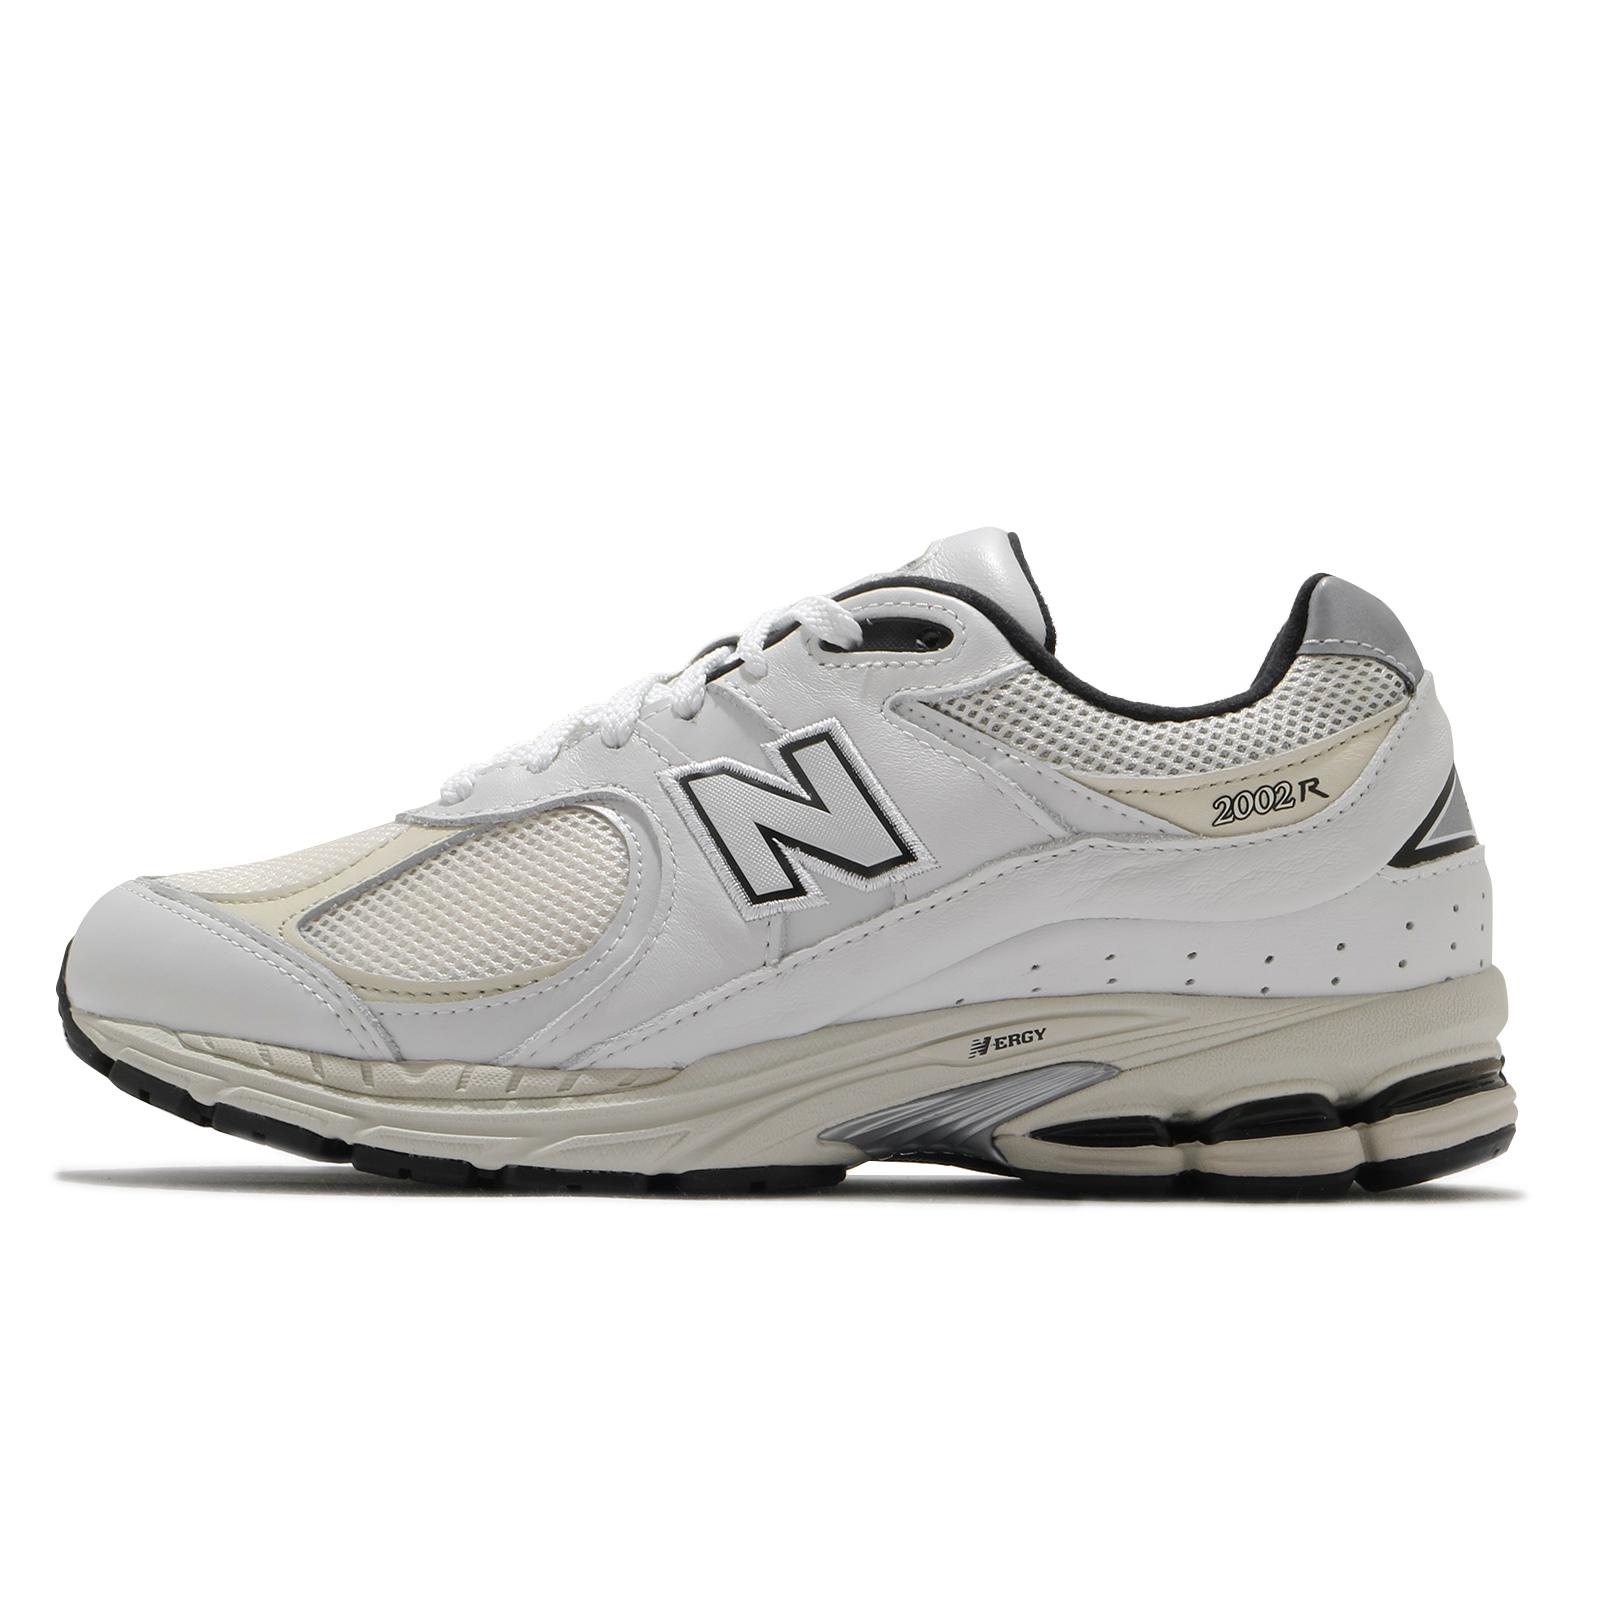 New Balance 慢跑鞋 2002R 男 女 全尺段 白 米白 復古 休閒 情侶鞋【ACS】 ML2002RQD